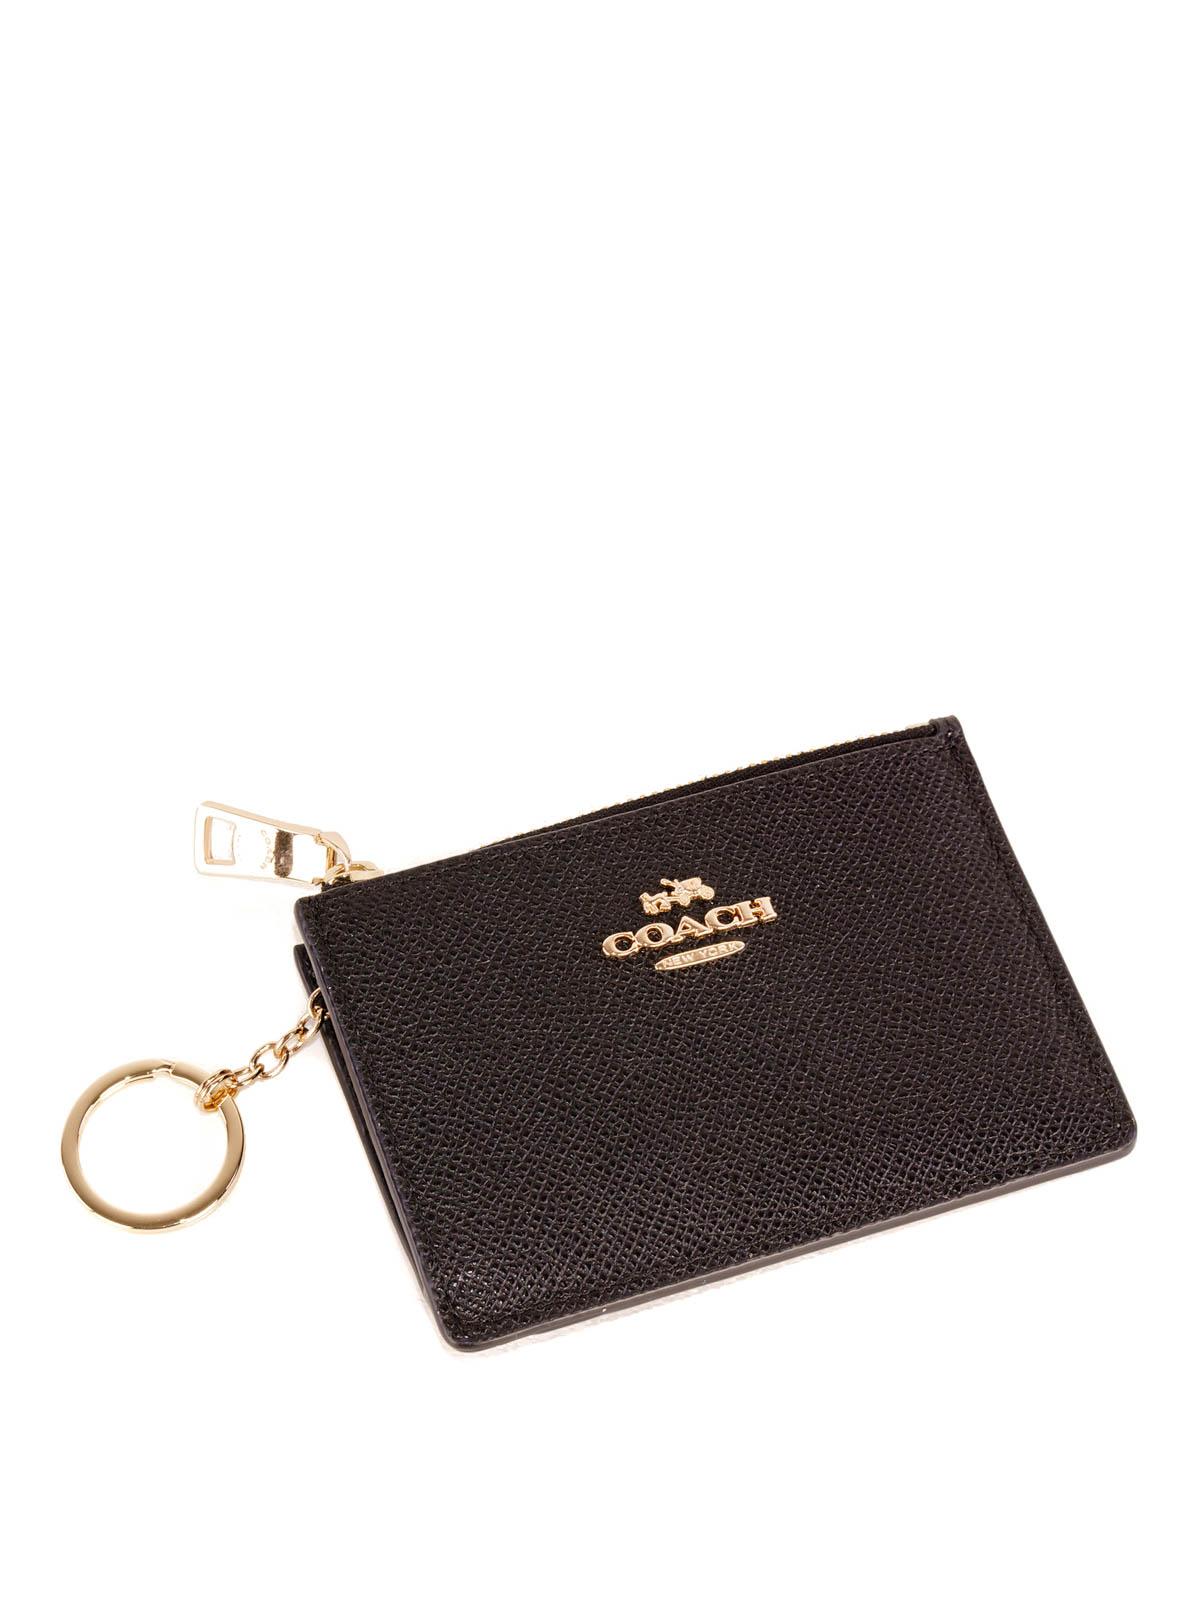 a54543a6c5 Coach - Mini Skinny leather card holder - wallets & purses - 52394 ...